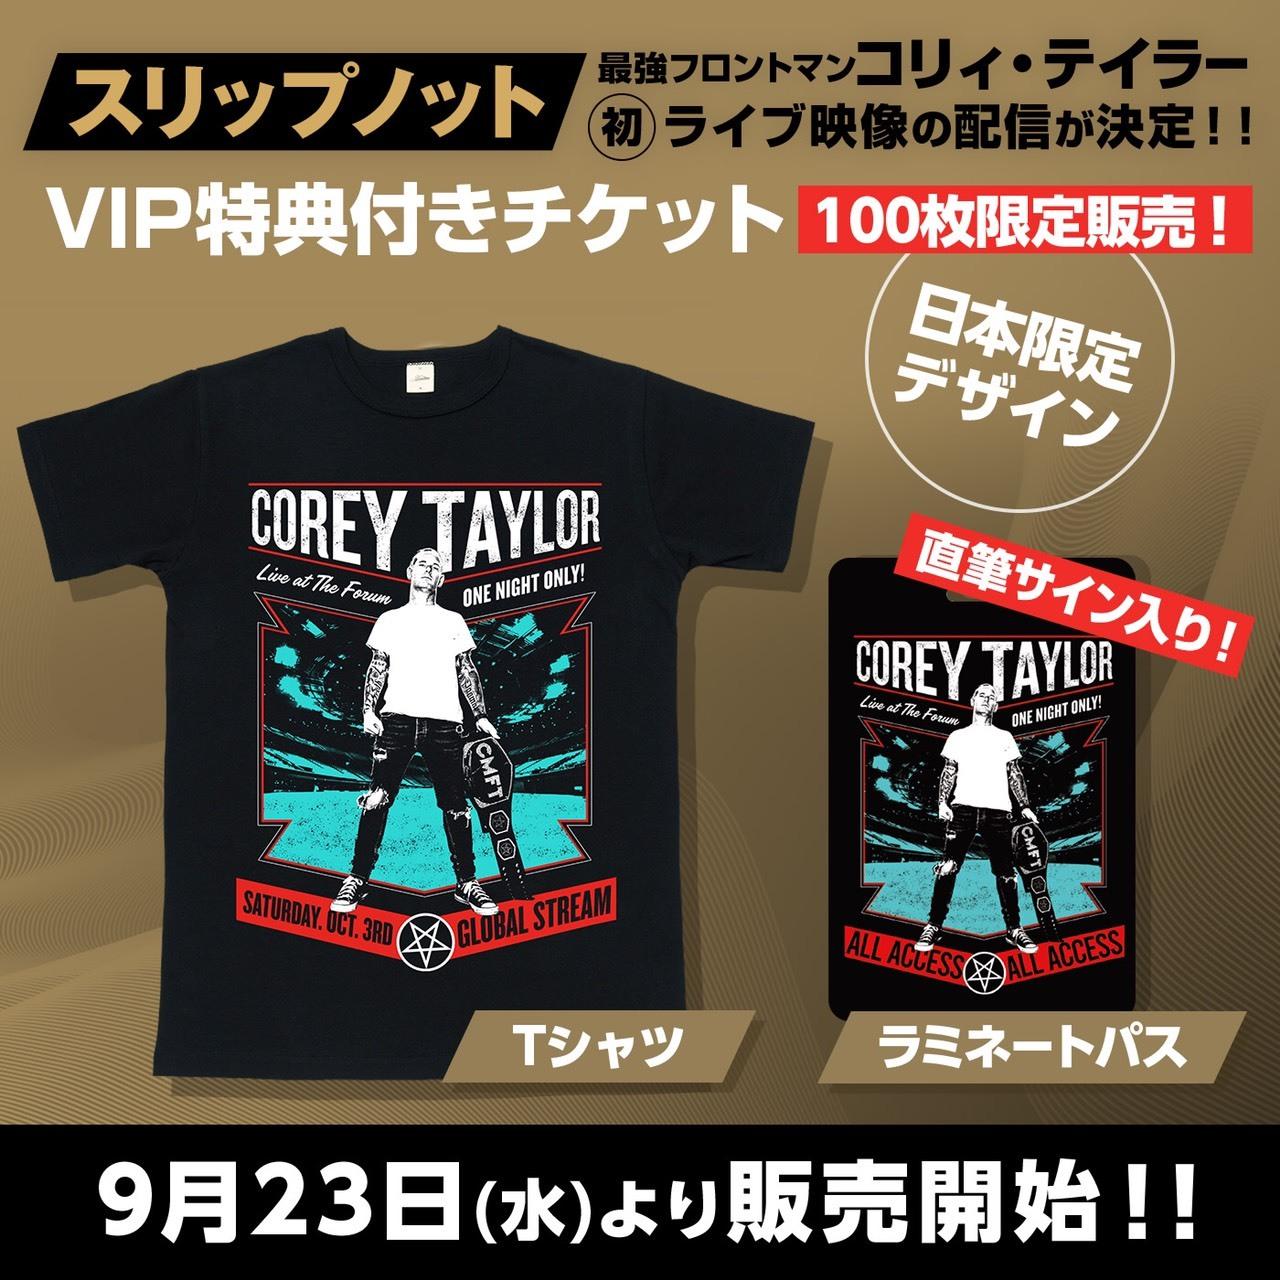 VIP特典付き視聴チケット